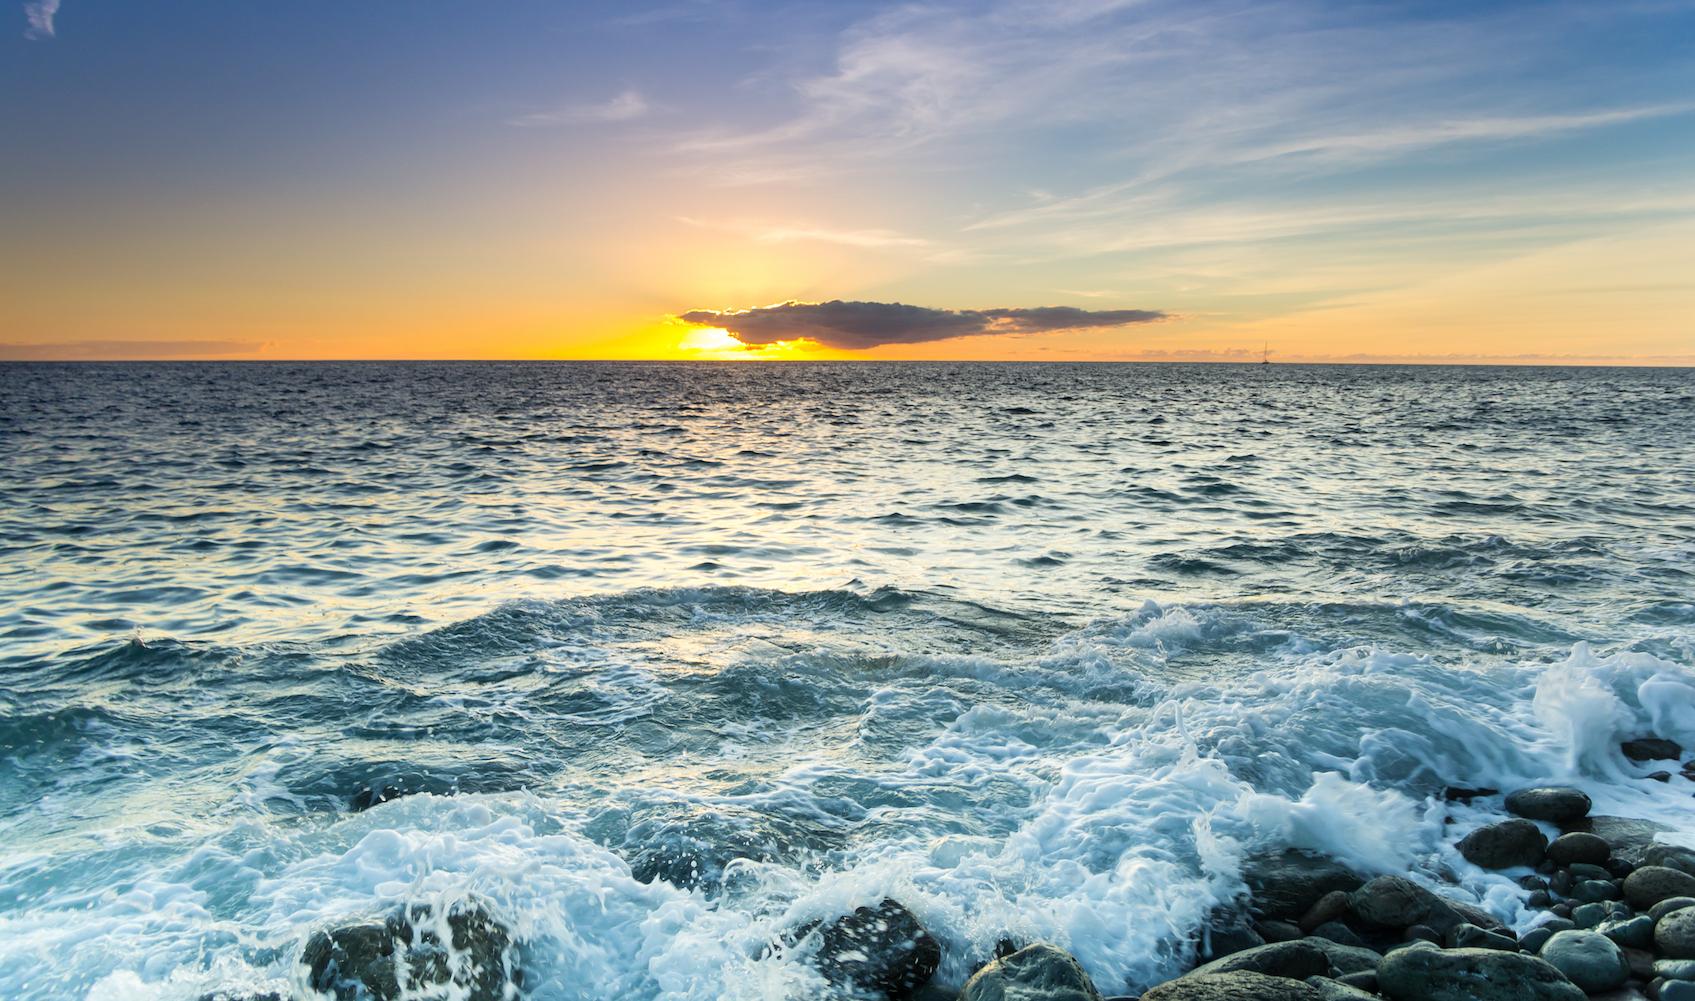 Atlantic Ocean S Circulation Conveyor Belt Is Slowing